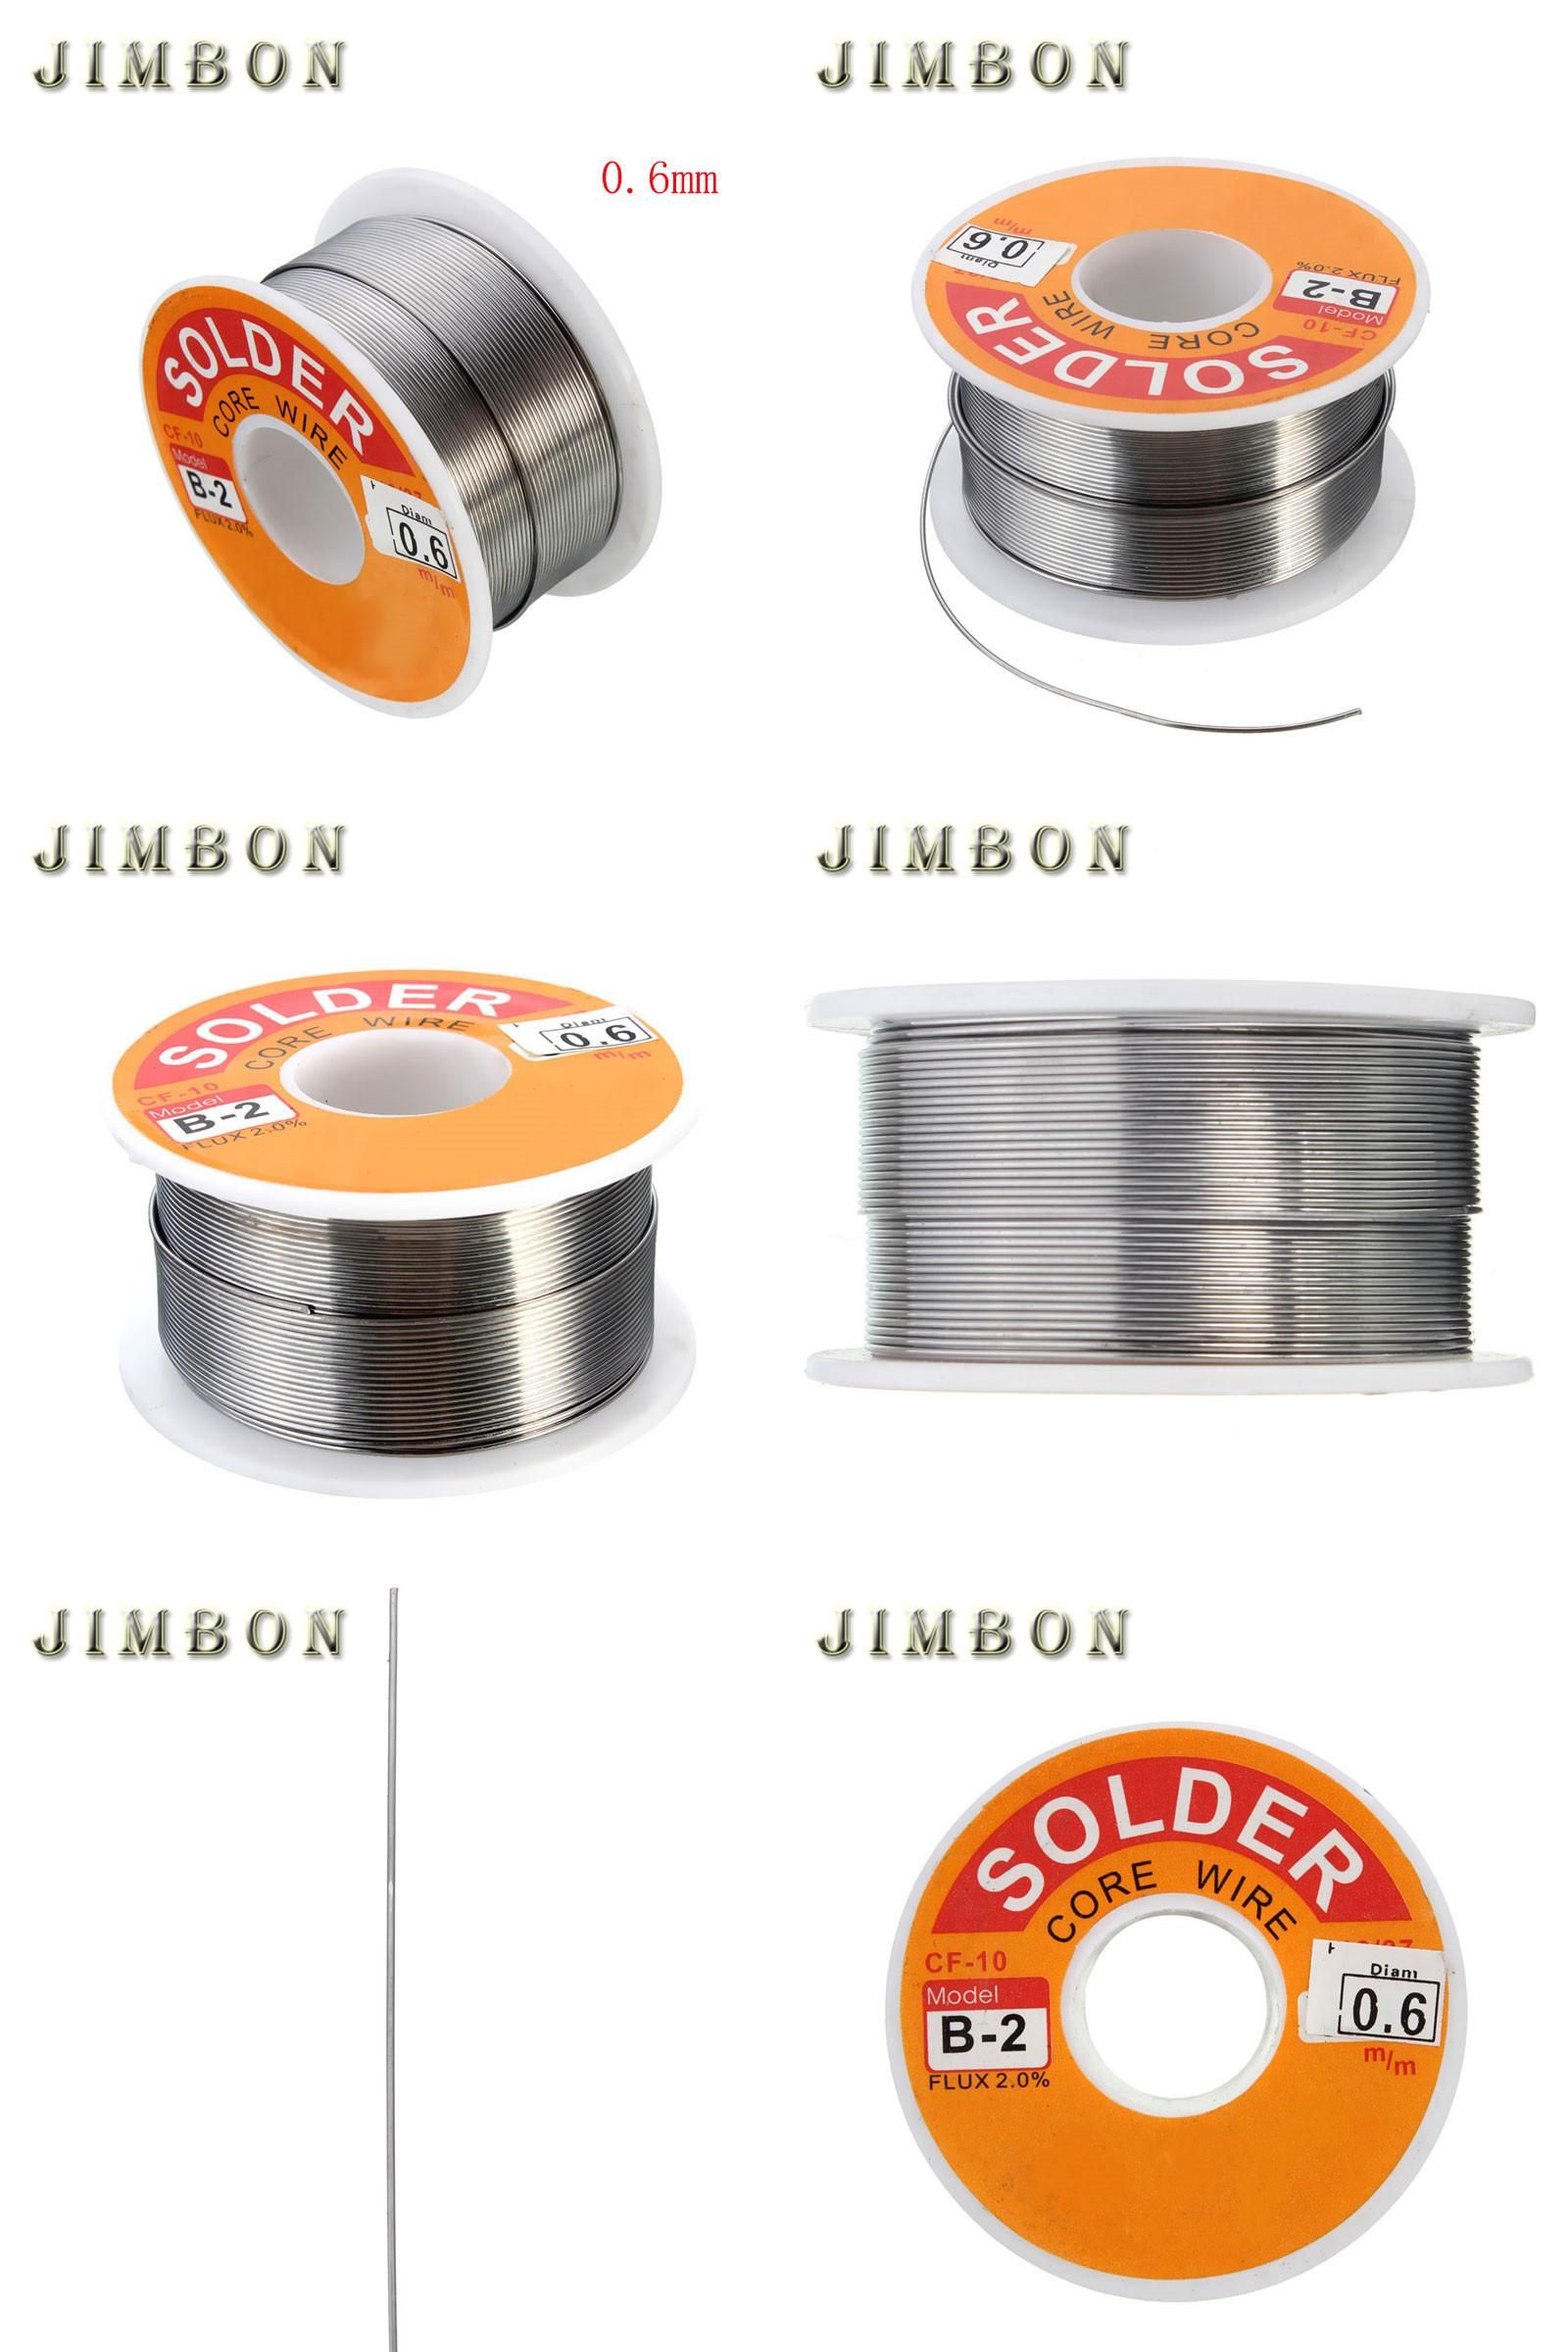 Visit To Buy 63 37 0 6mm 100g 3 5oz Tin Lead Line Rosin Core Flux Solder Welding Iron Wire Reel Solder Soldering Tools A Soldering Tools Iron Wire Wire Reel